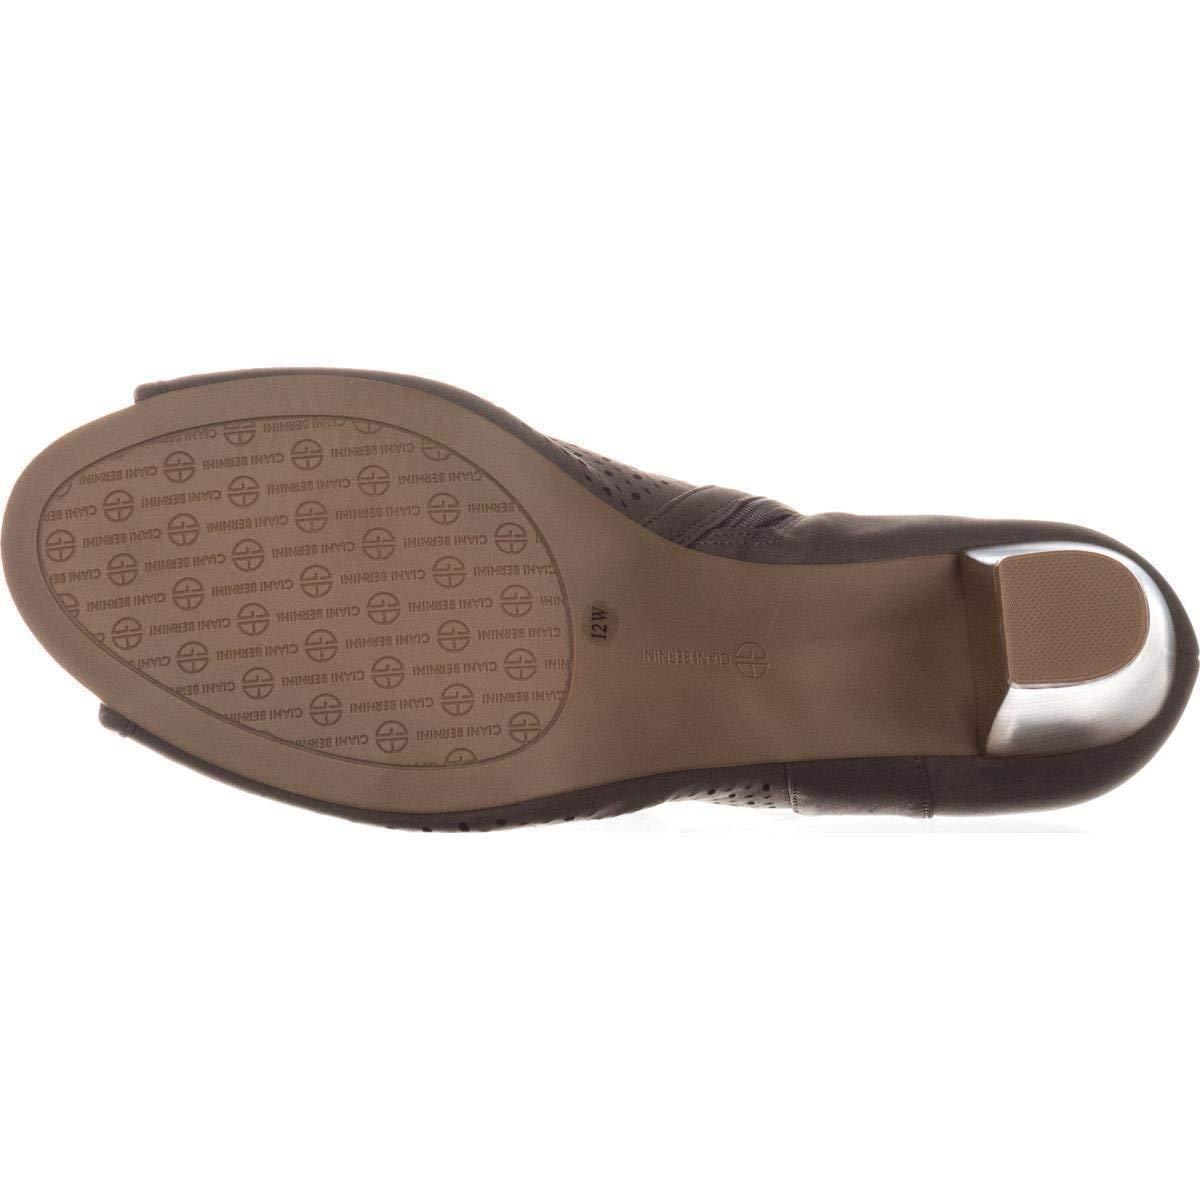 Giani Bernini Frauen Angye Offener Zeh Fashion Stiefel Stiefel Stiefel Grau Groesse 7 US  38 EU 4be089